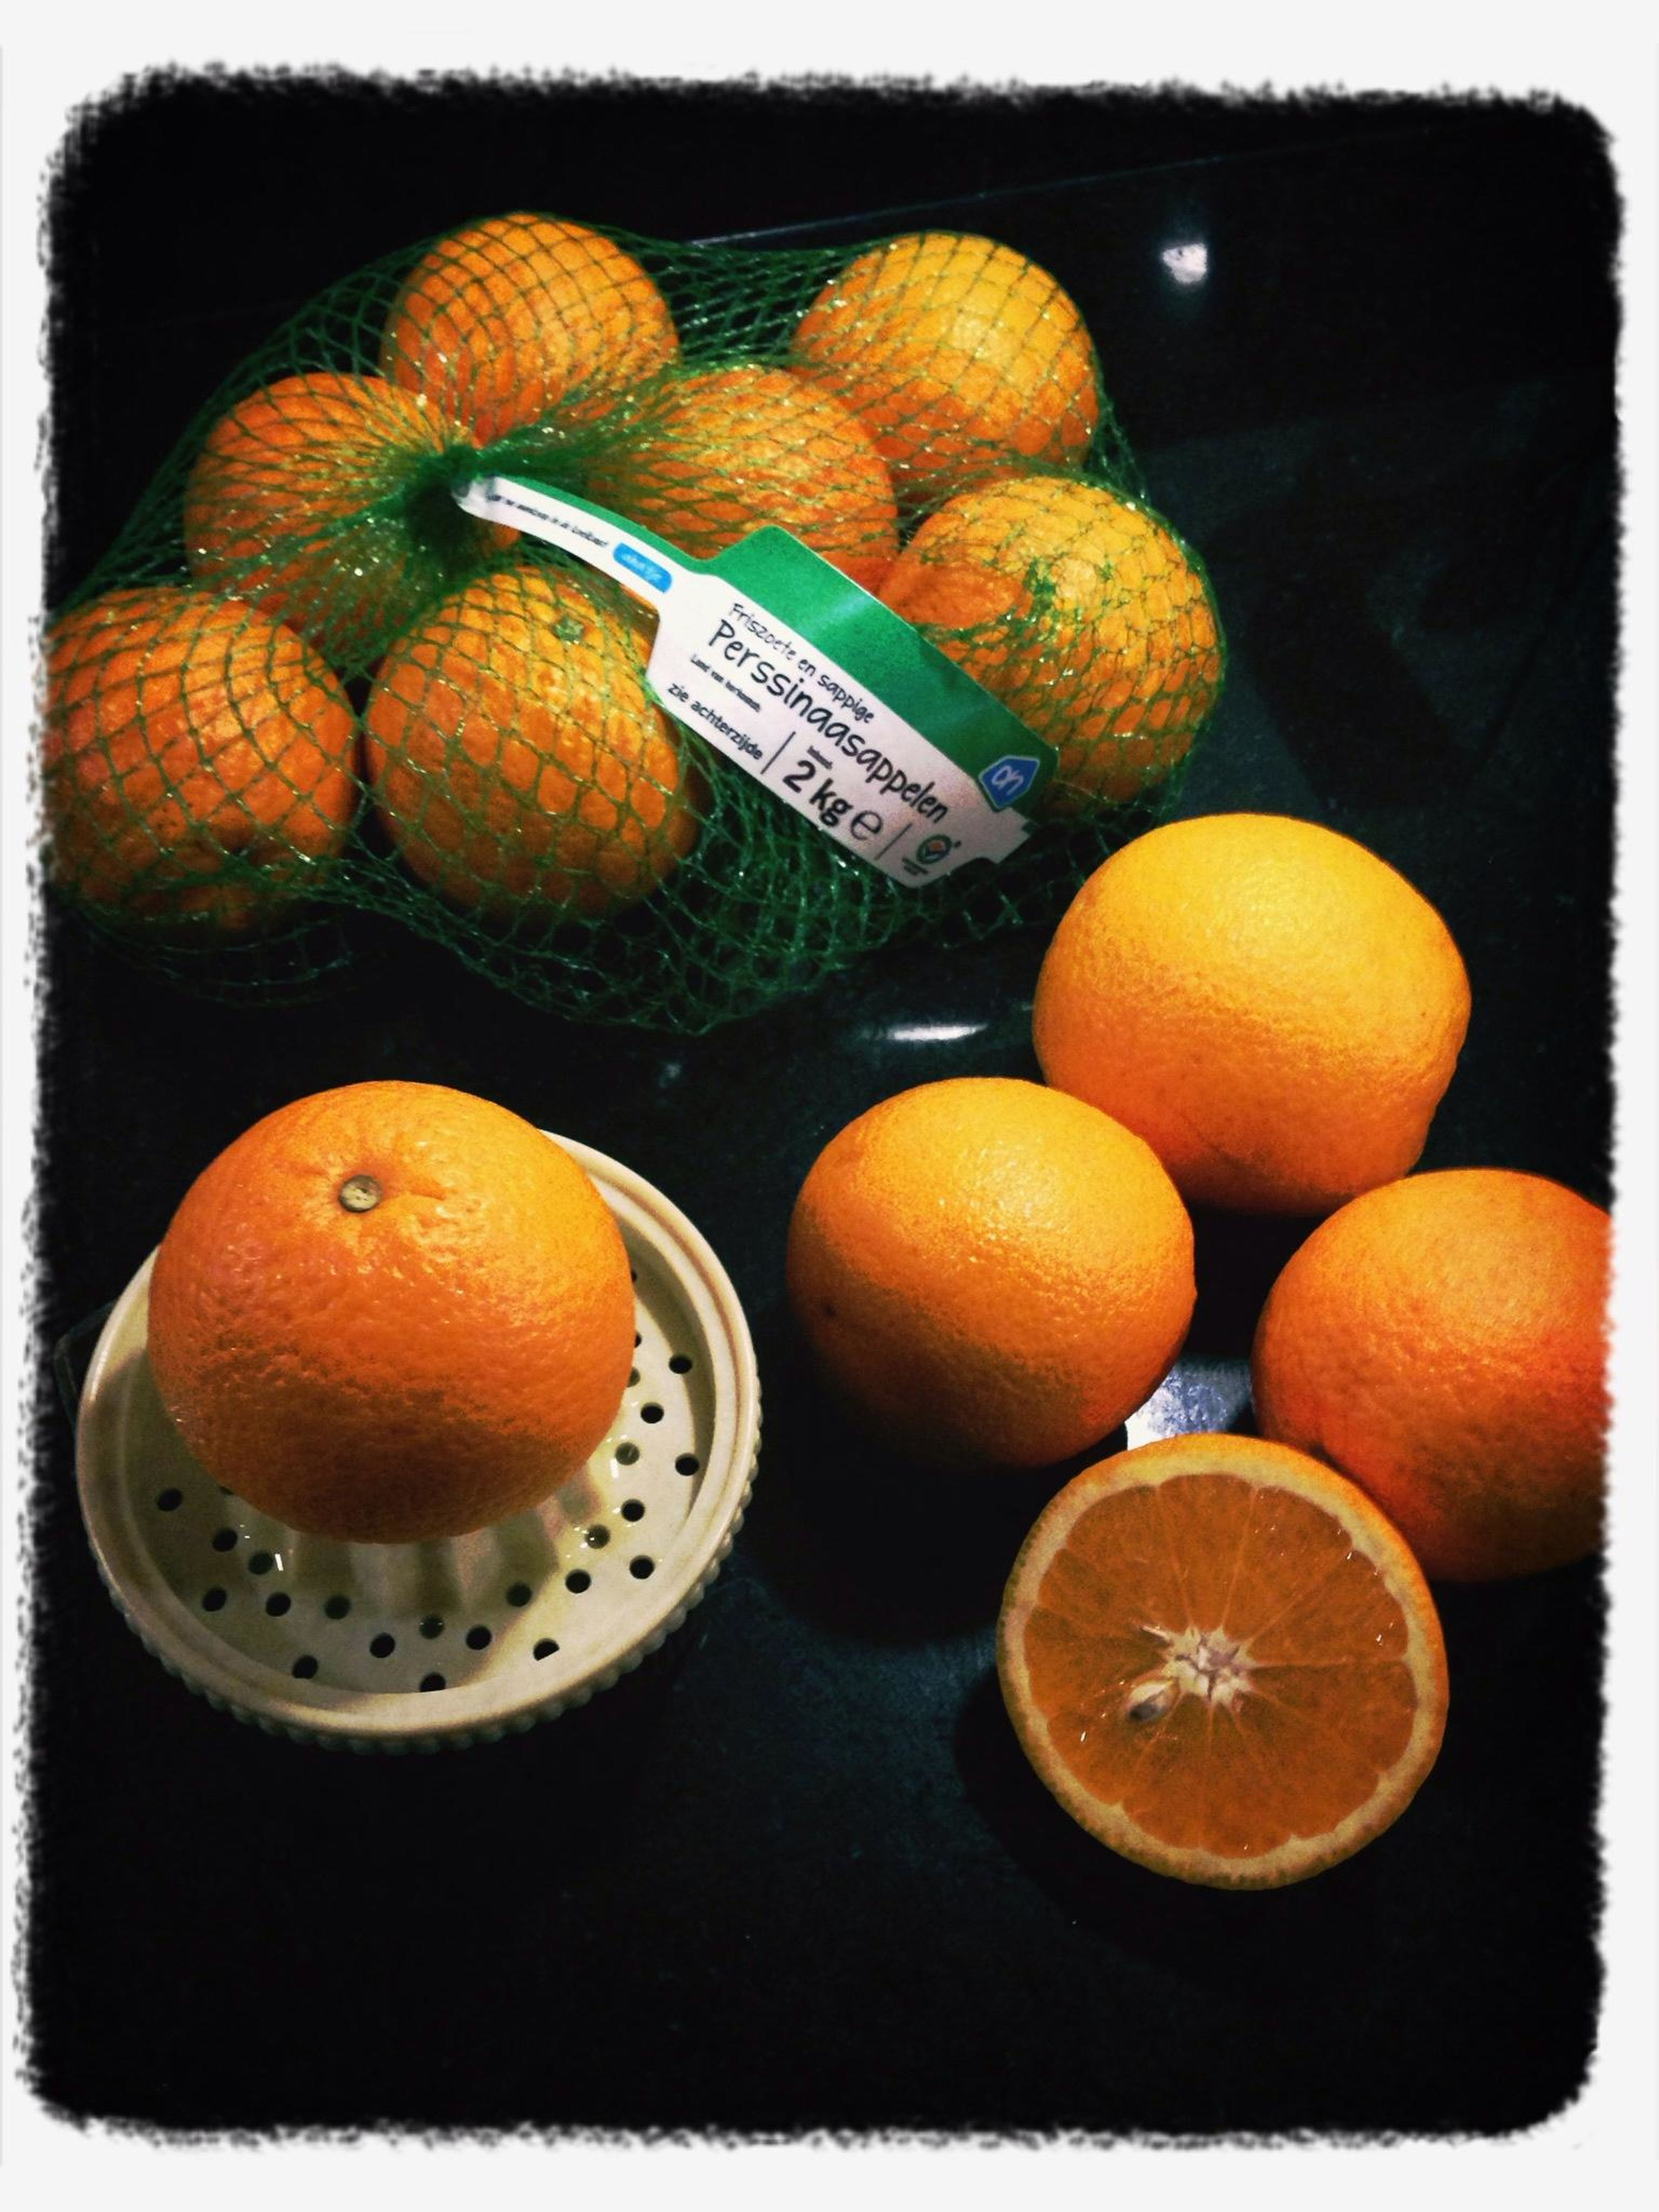 Orangejuice Iloveorangejuice Vitamins For My Lovely Sister